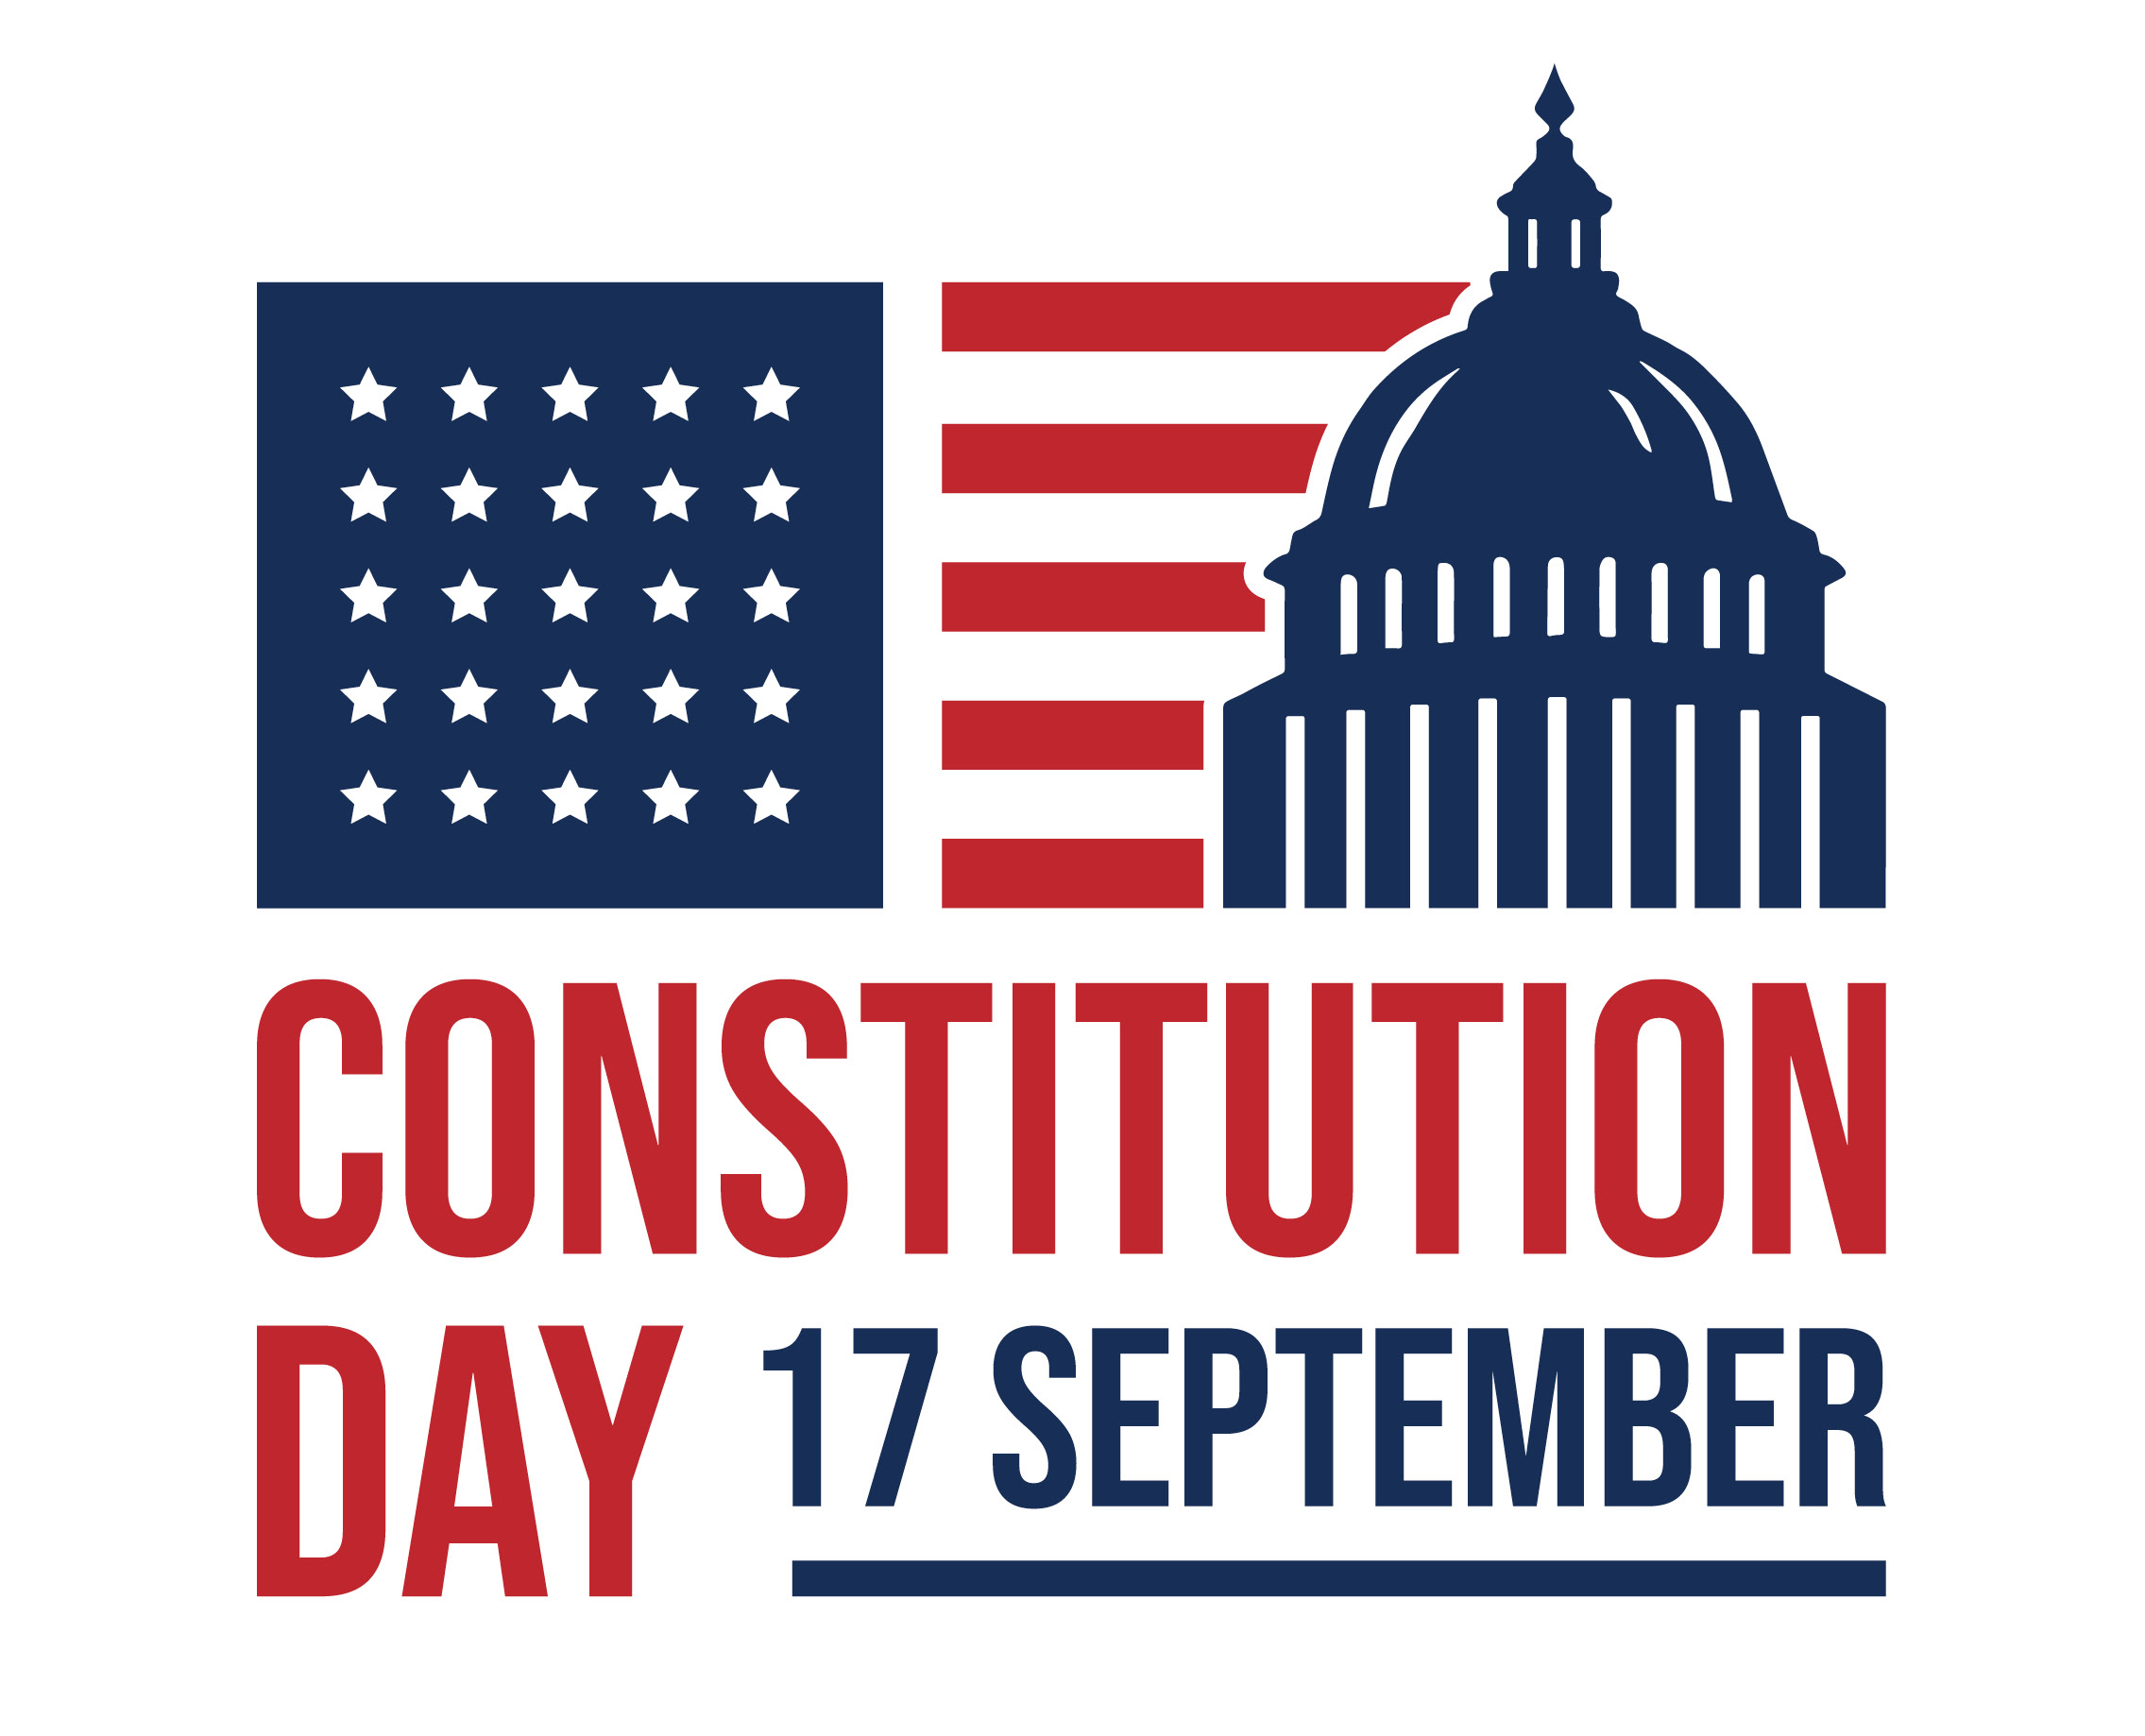 Constitution Day, 17 September